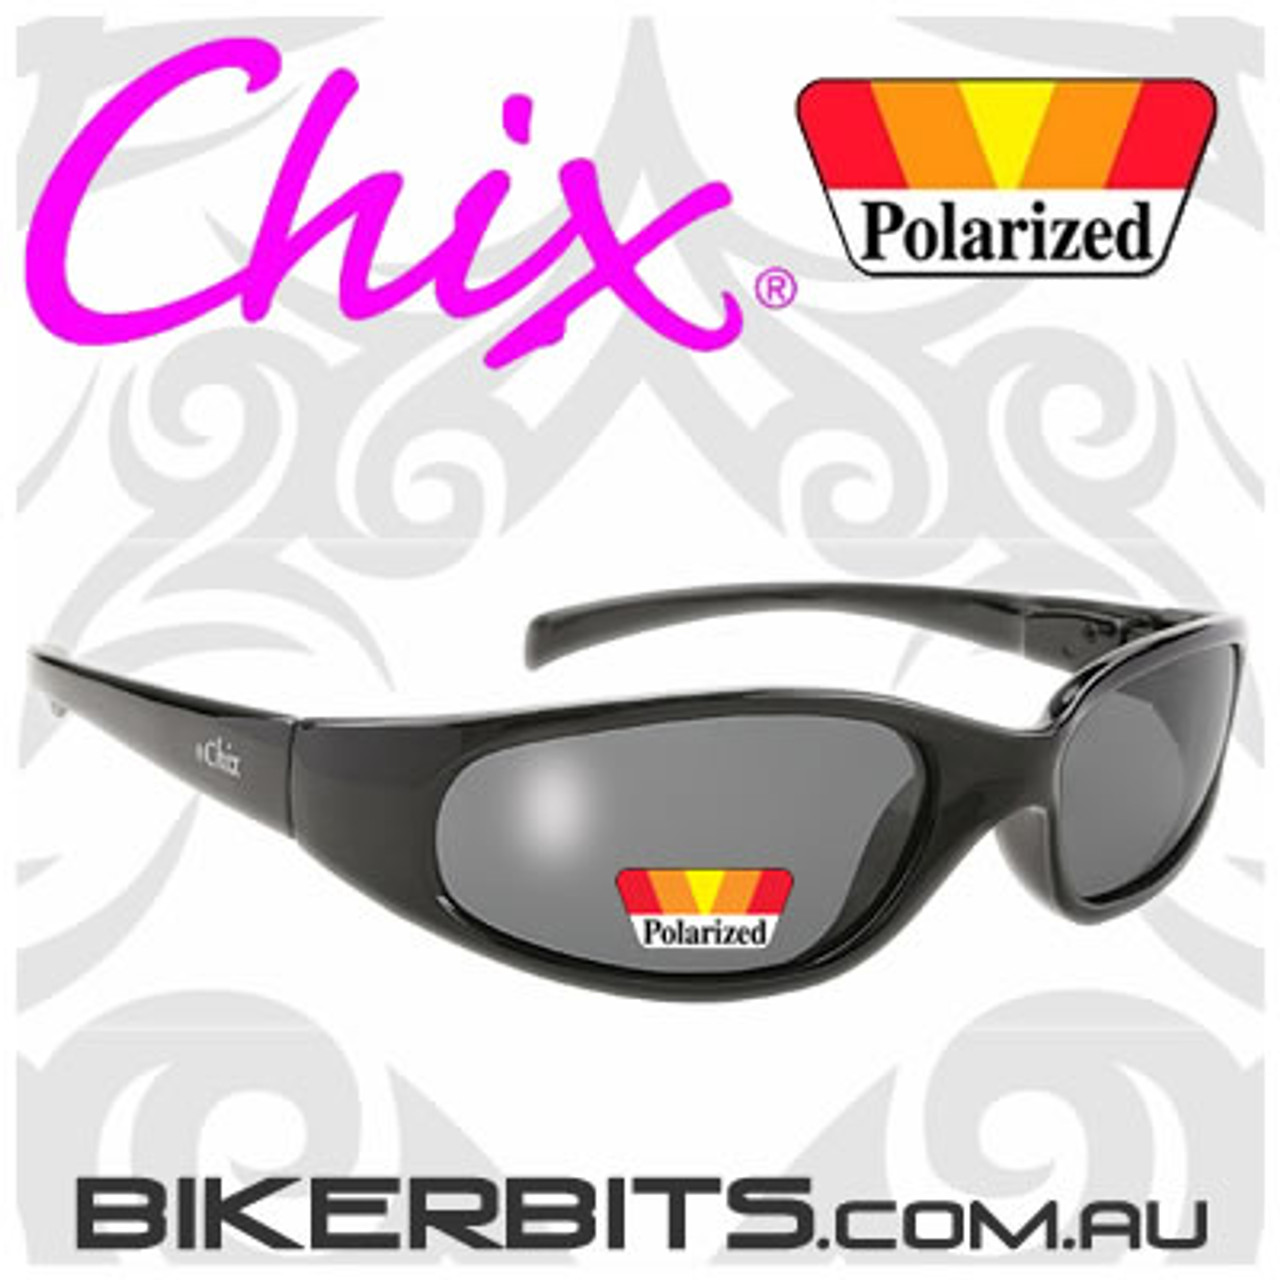 Motorcycle Sunglasses - Chix Heavenly - Polarized Smoke/Black